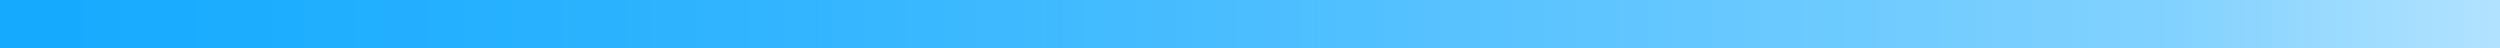 CB_gradientline-thin.jpg